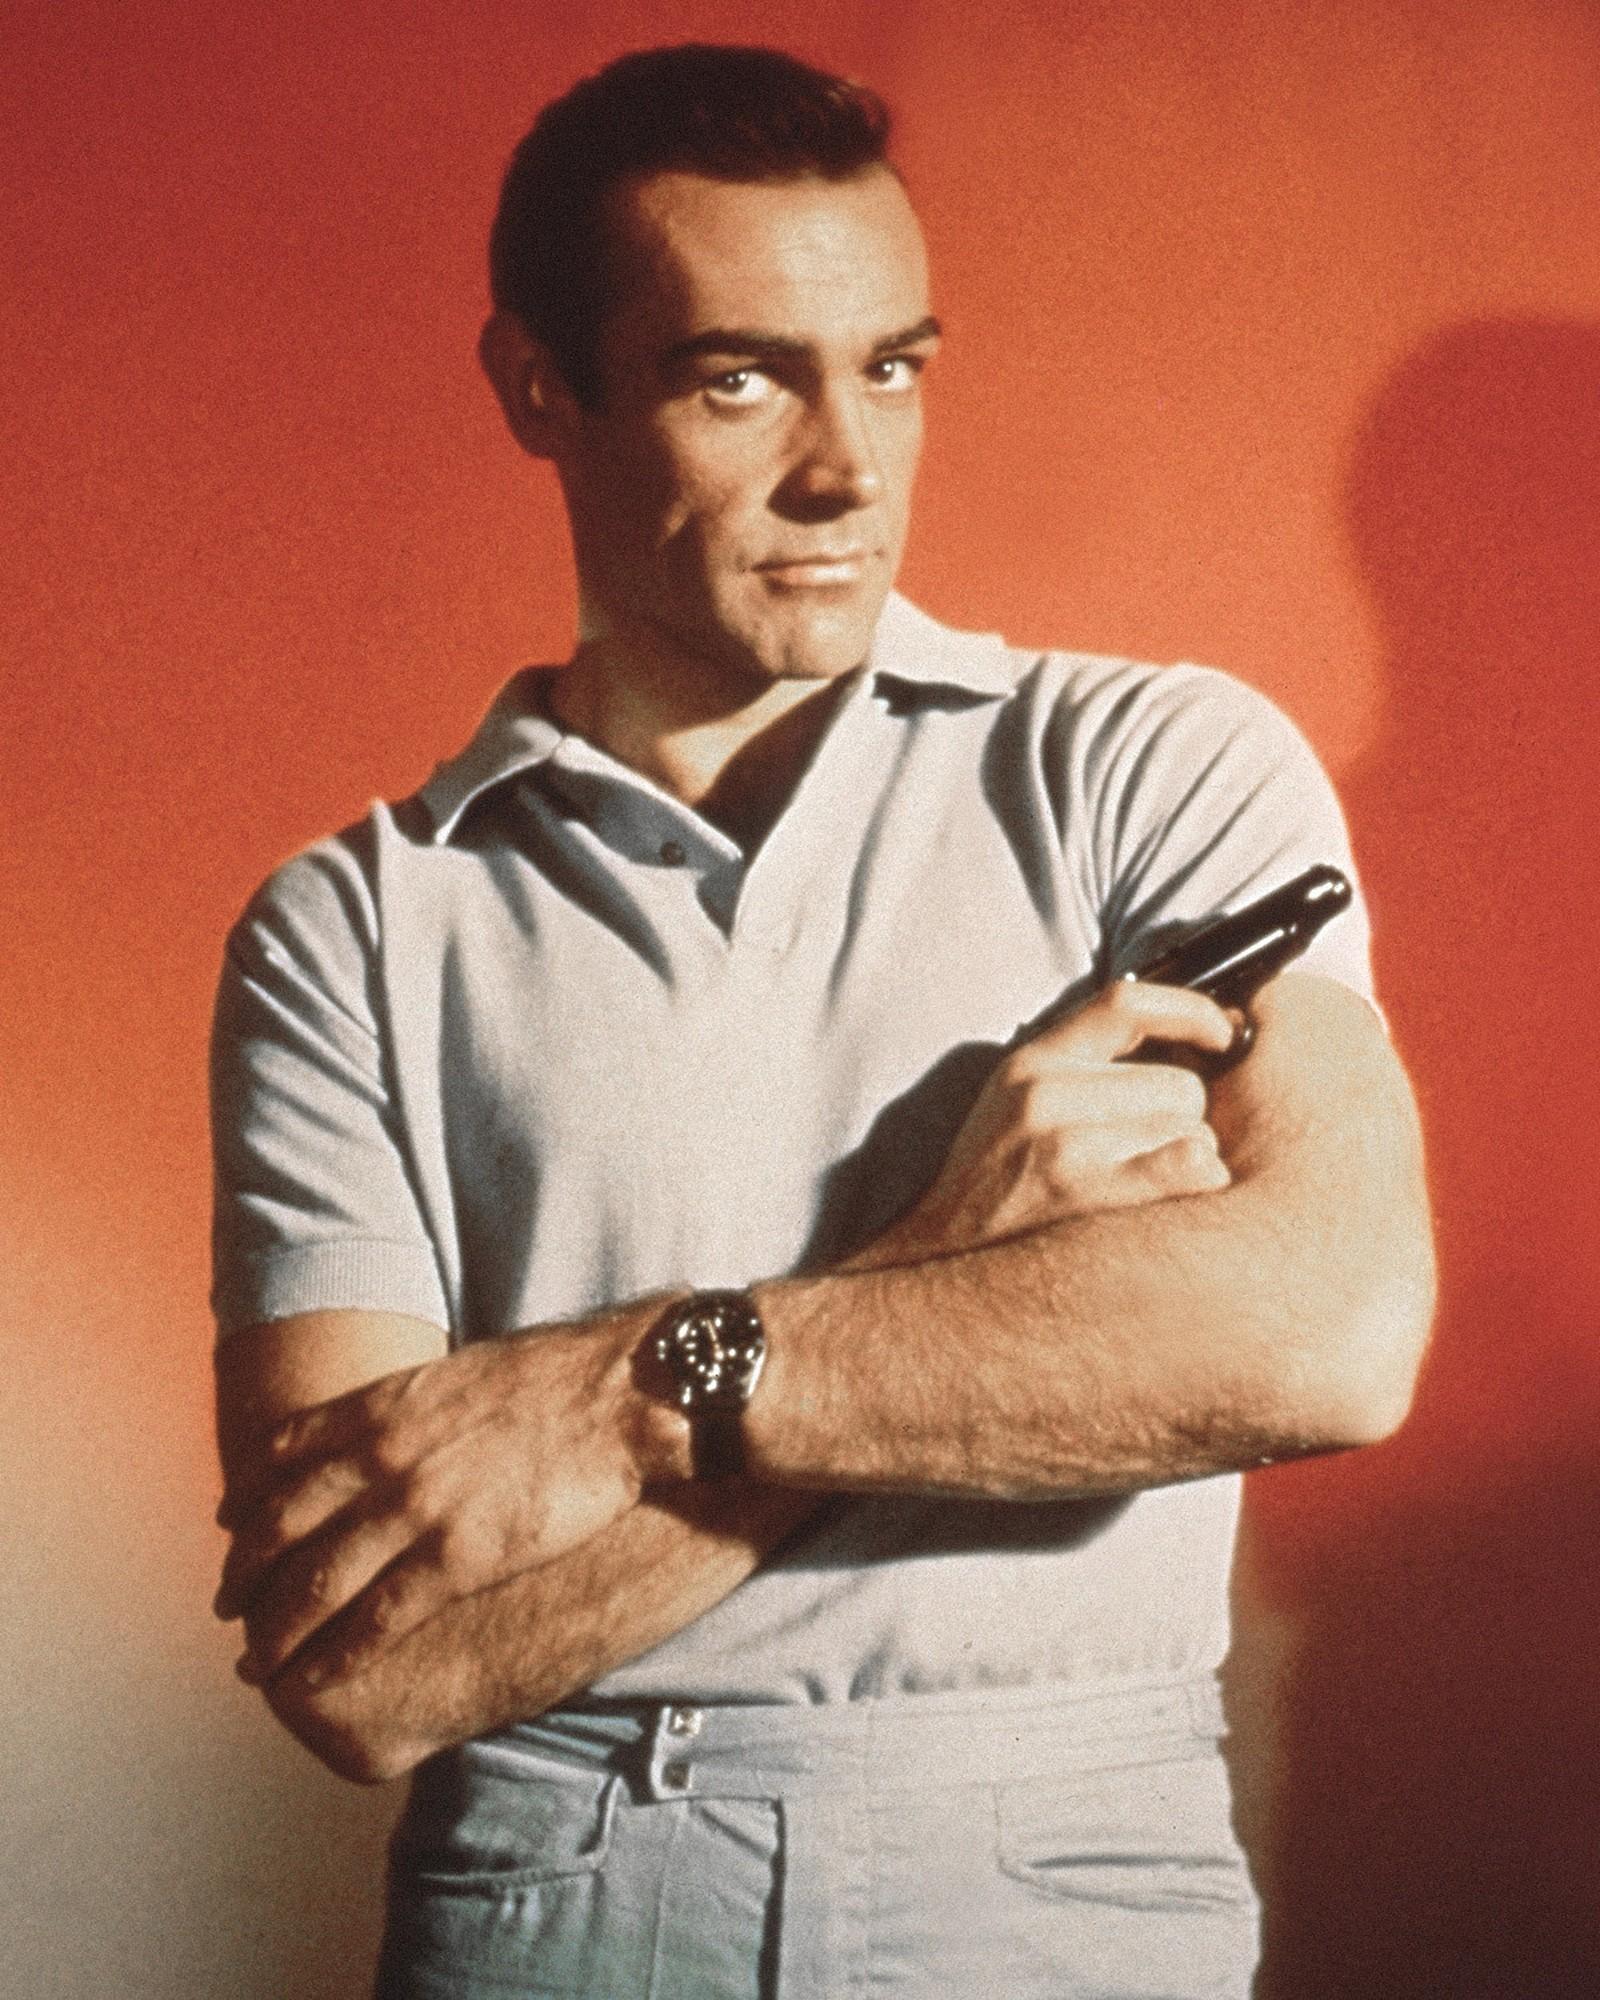 Missing Watches - James Bond Sean Connery Rolex Submariner 6538 - 2